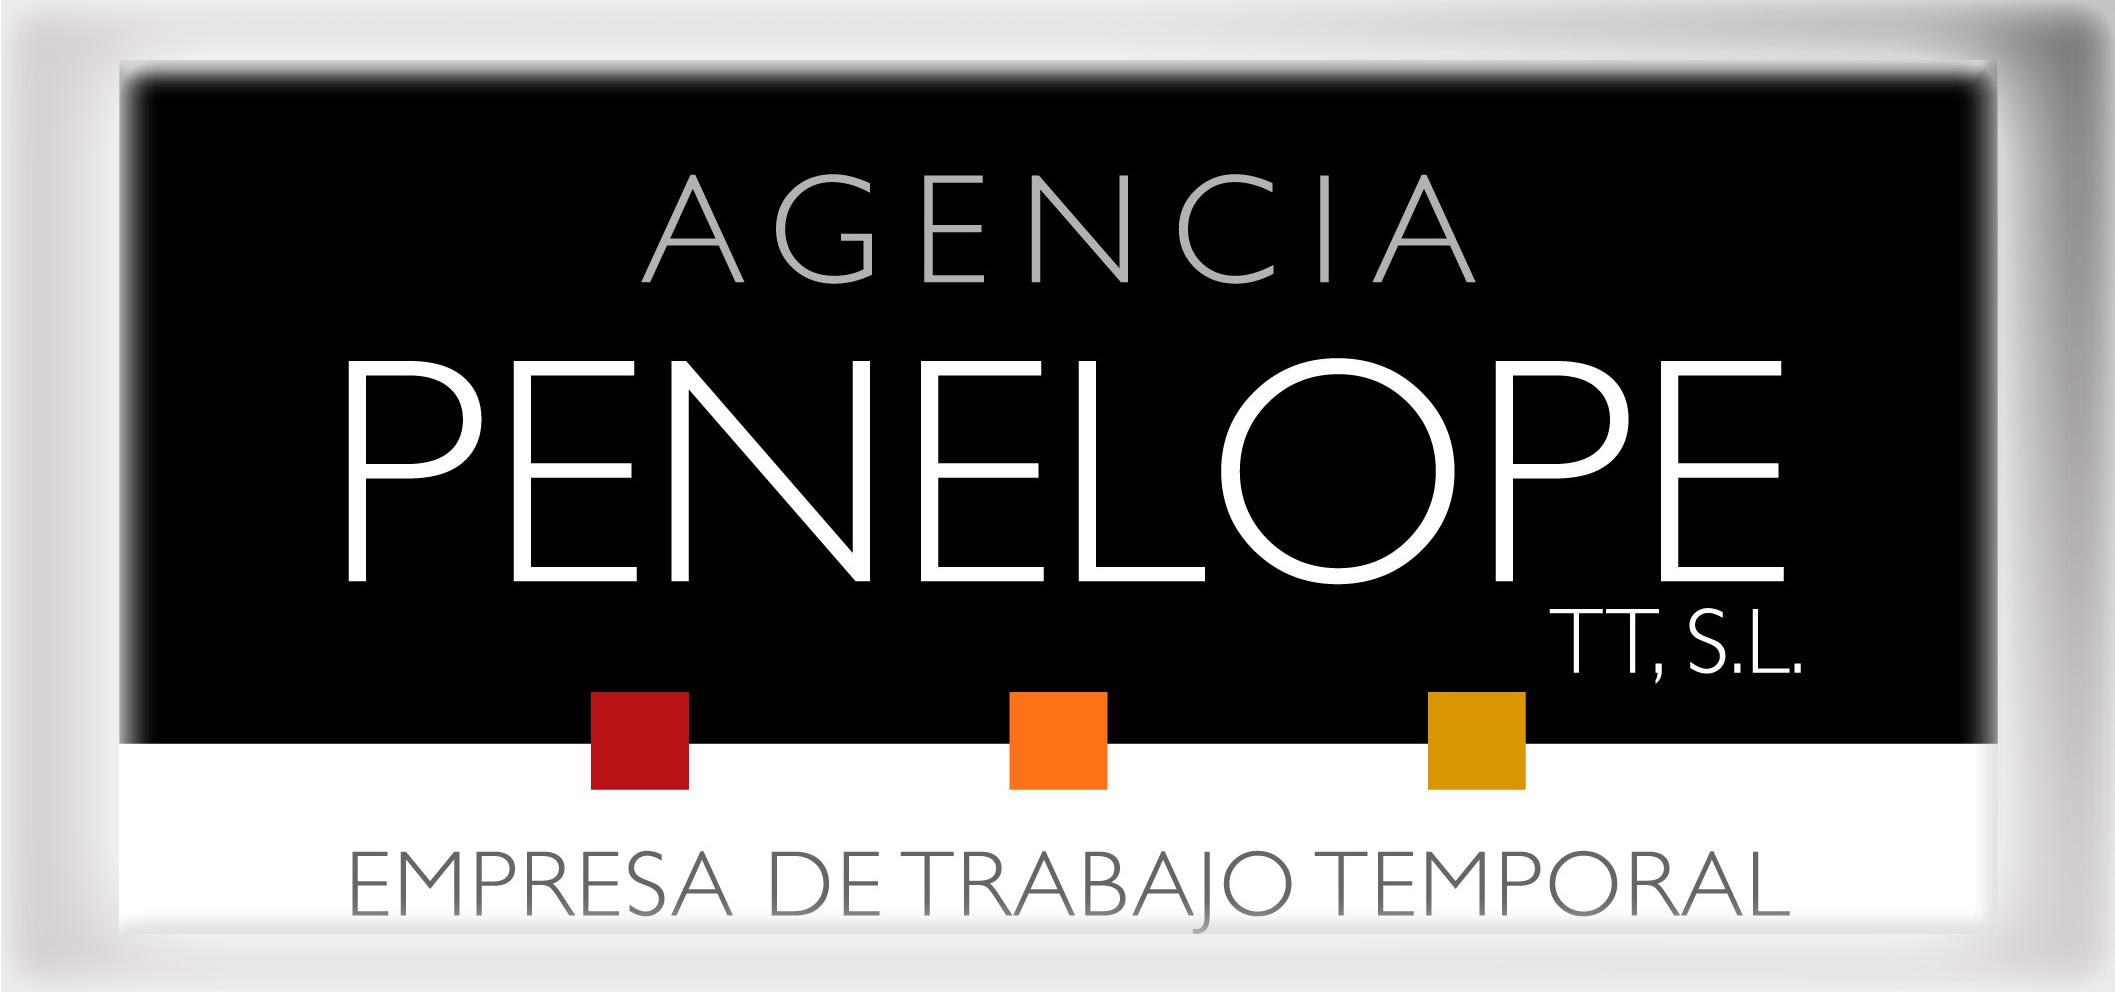 Agencia Penelope